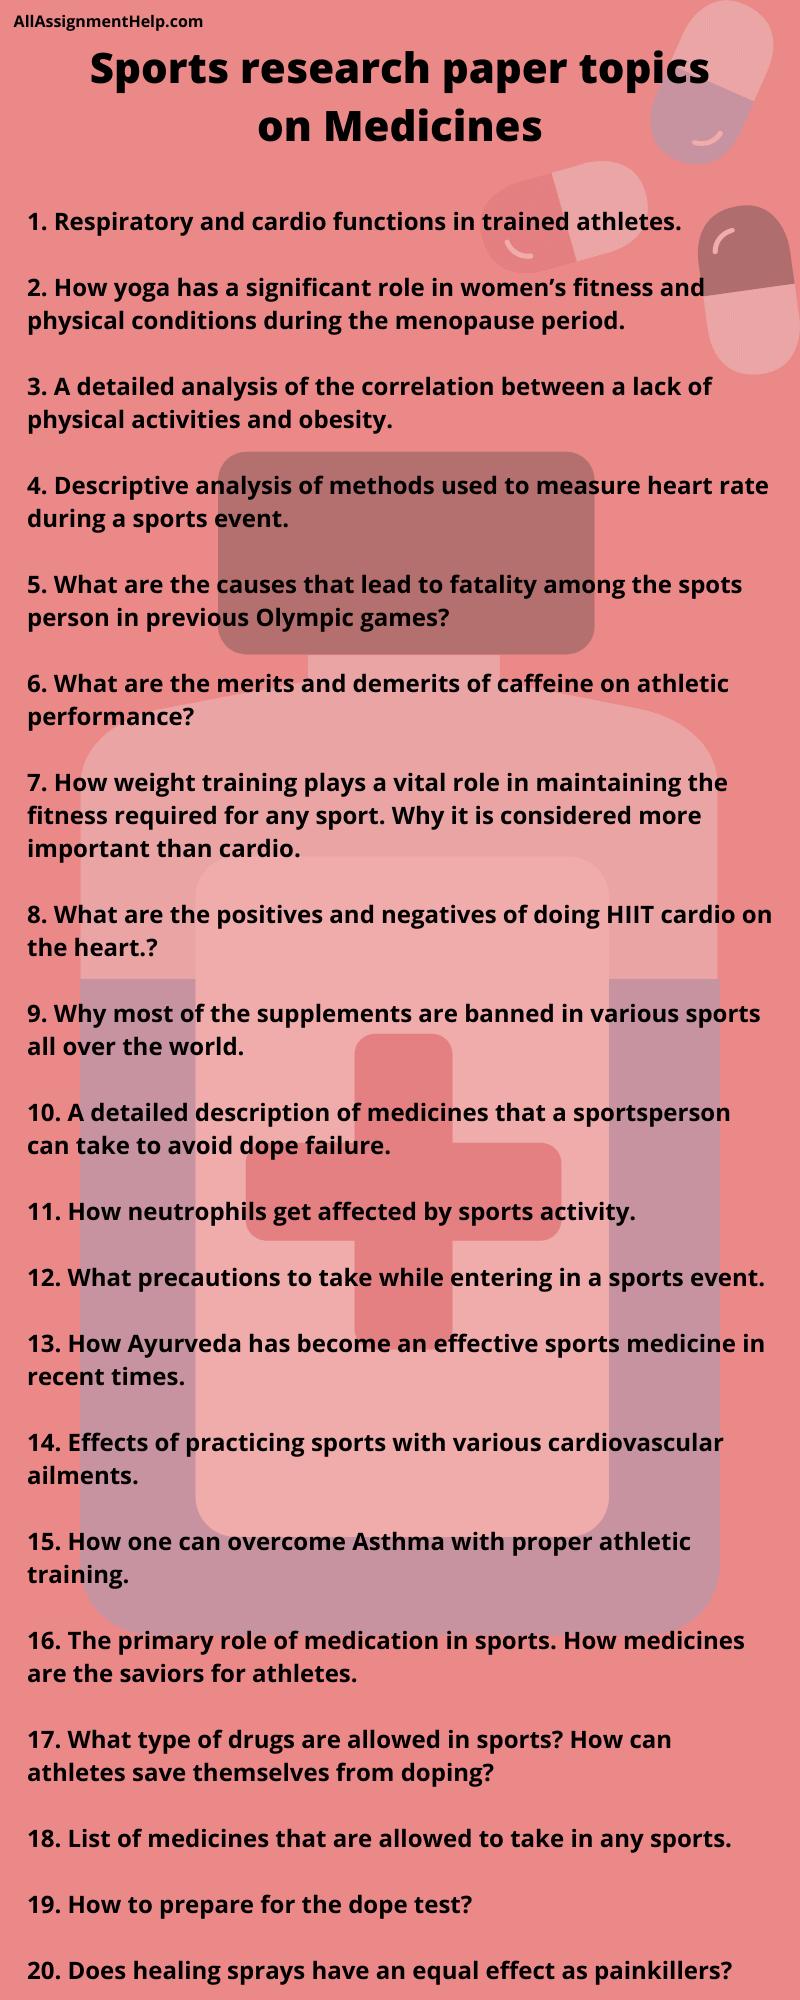 sports-research-paper-topics-medicine